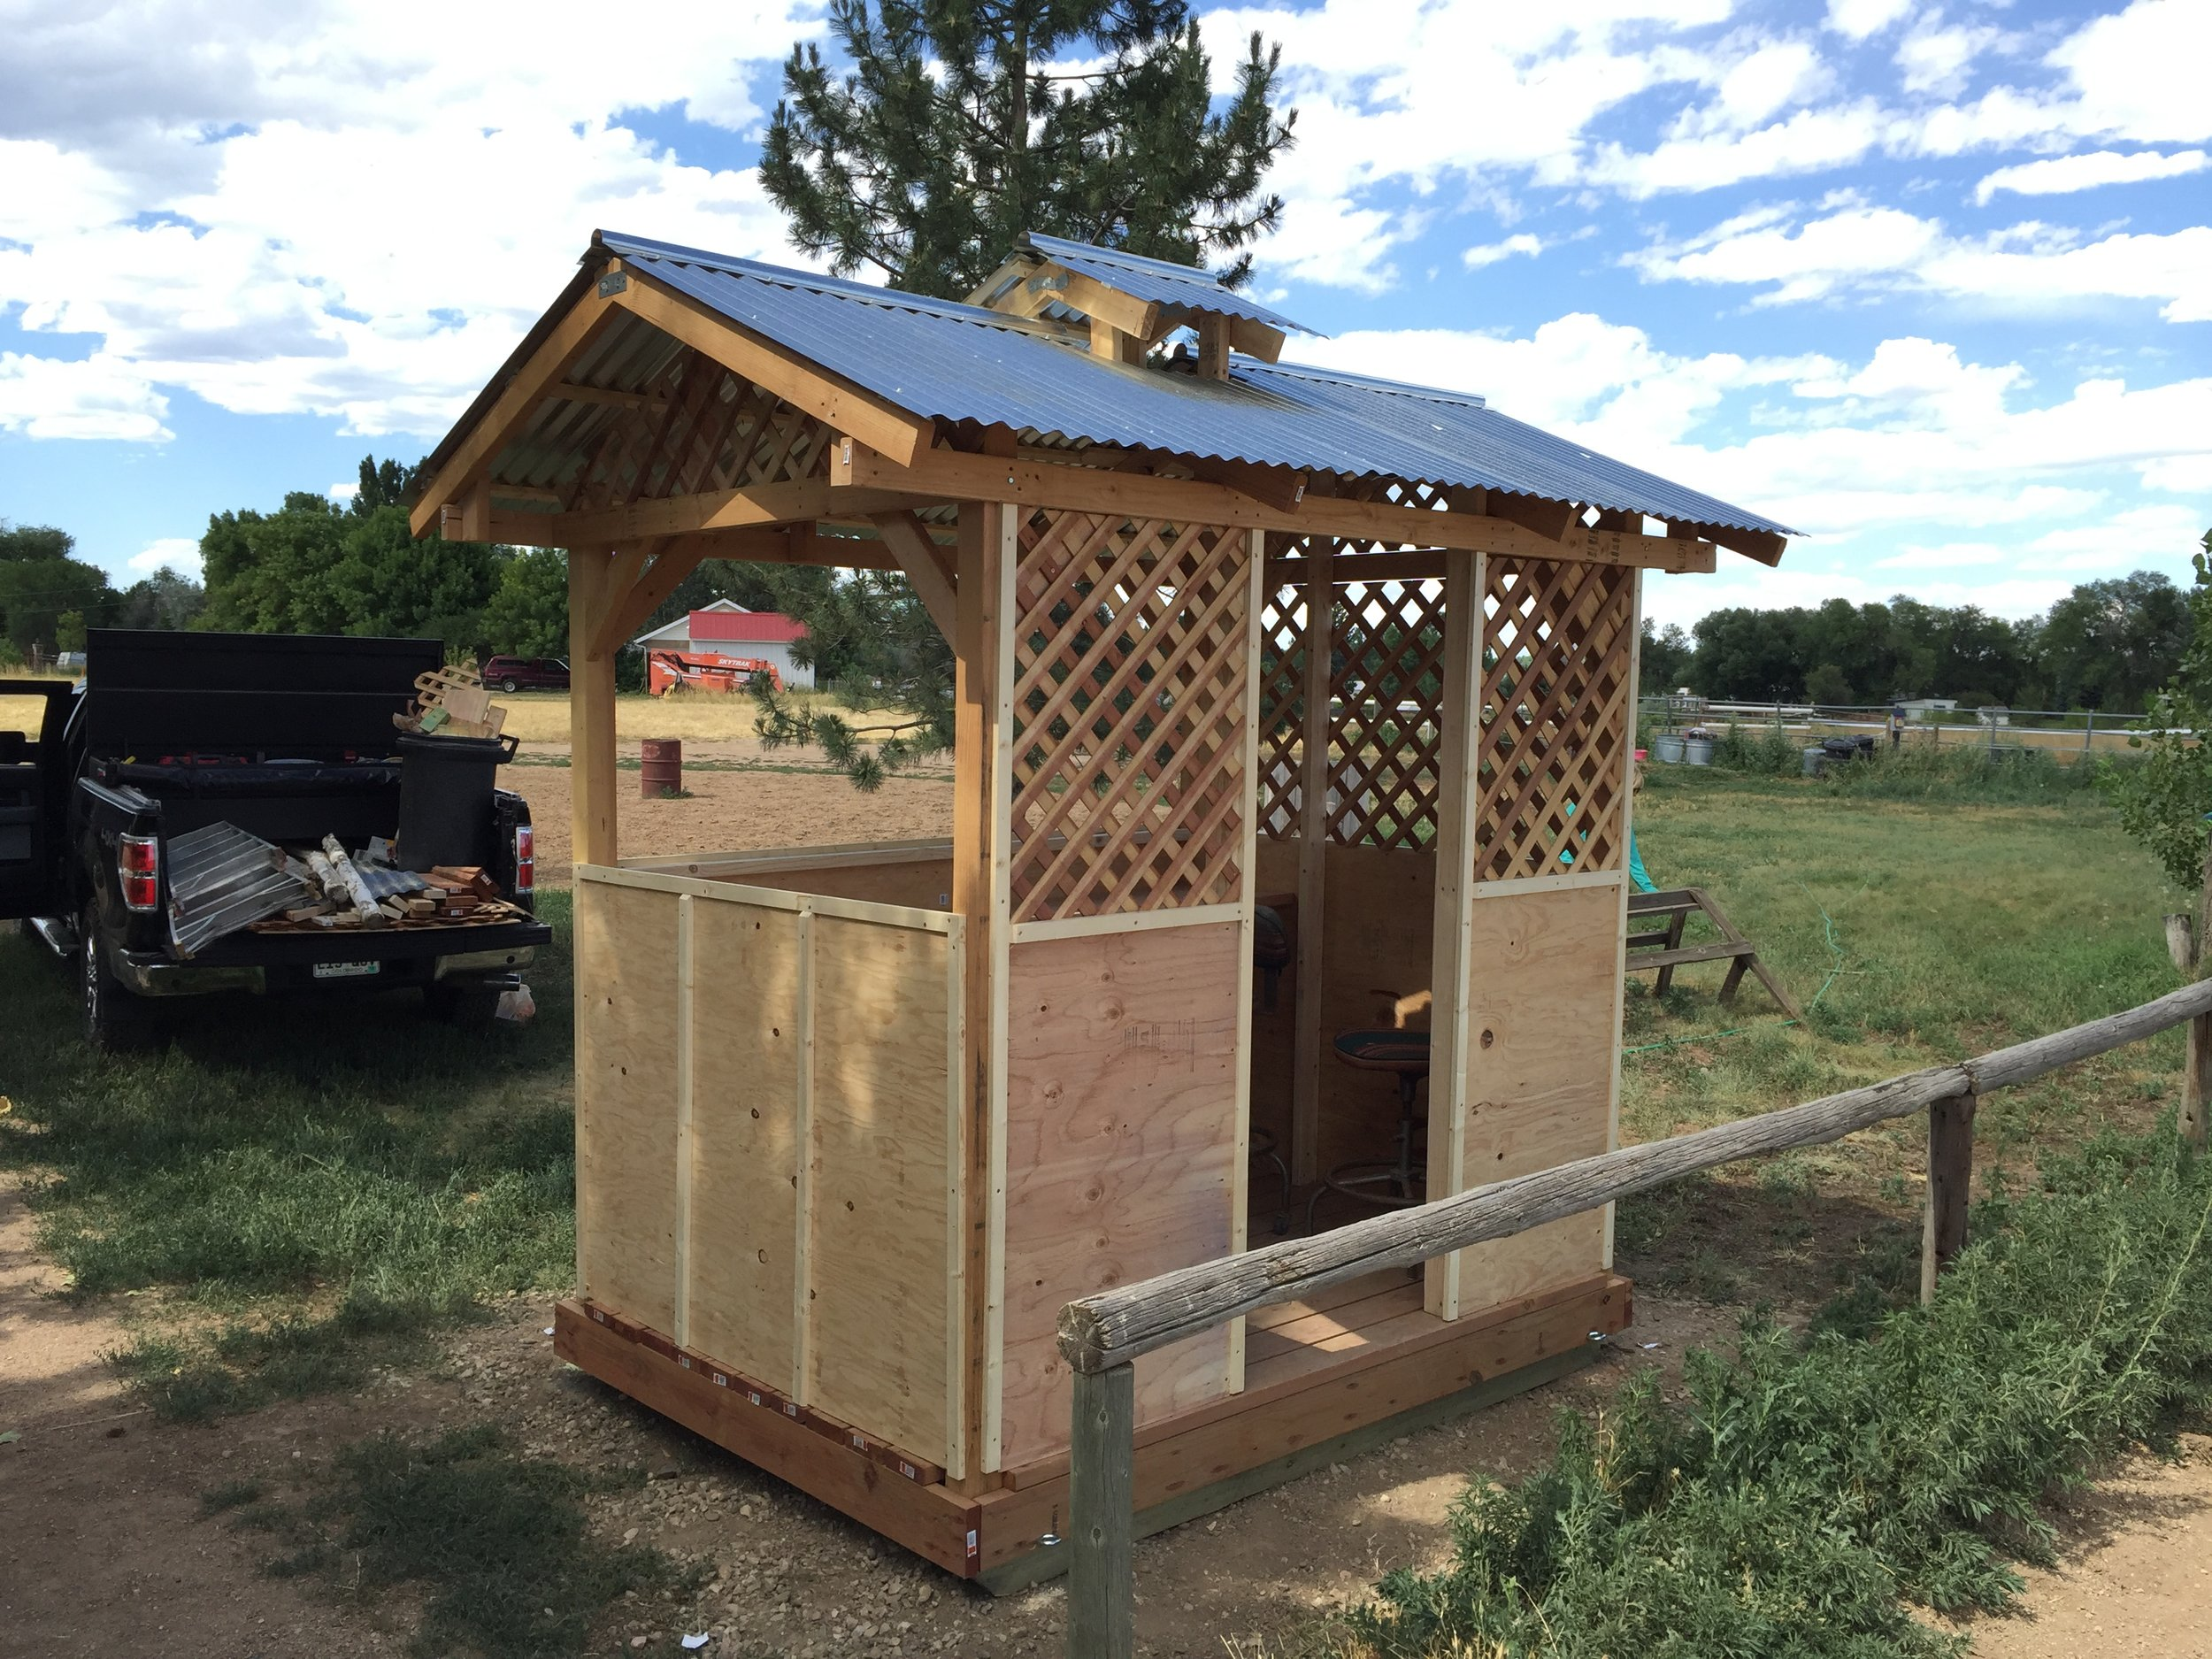 Gazebo built for Horse Show announcer's booth. Live power installed inside